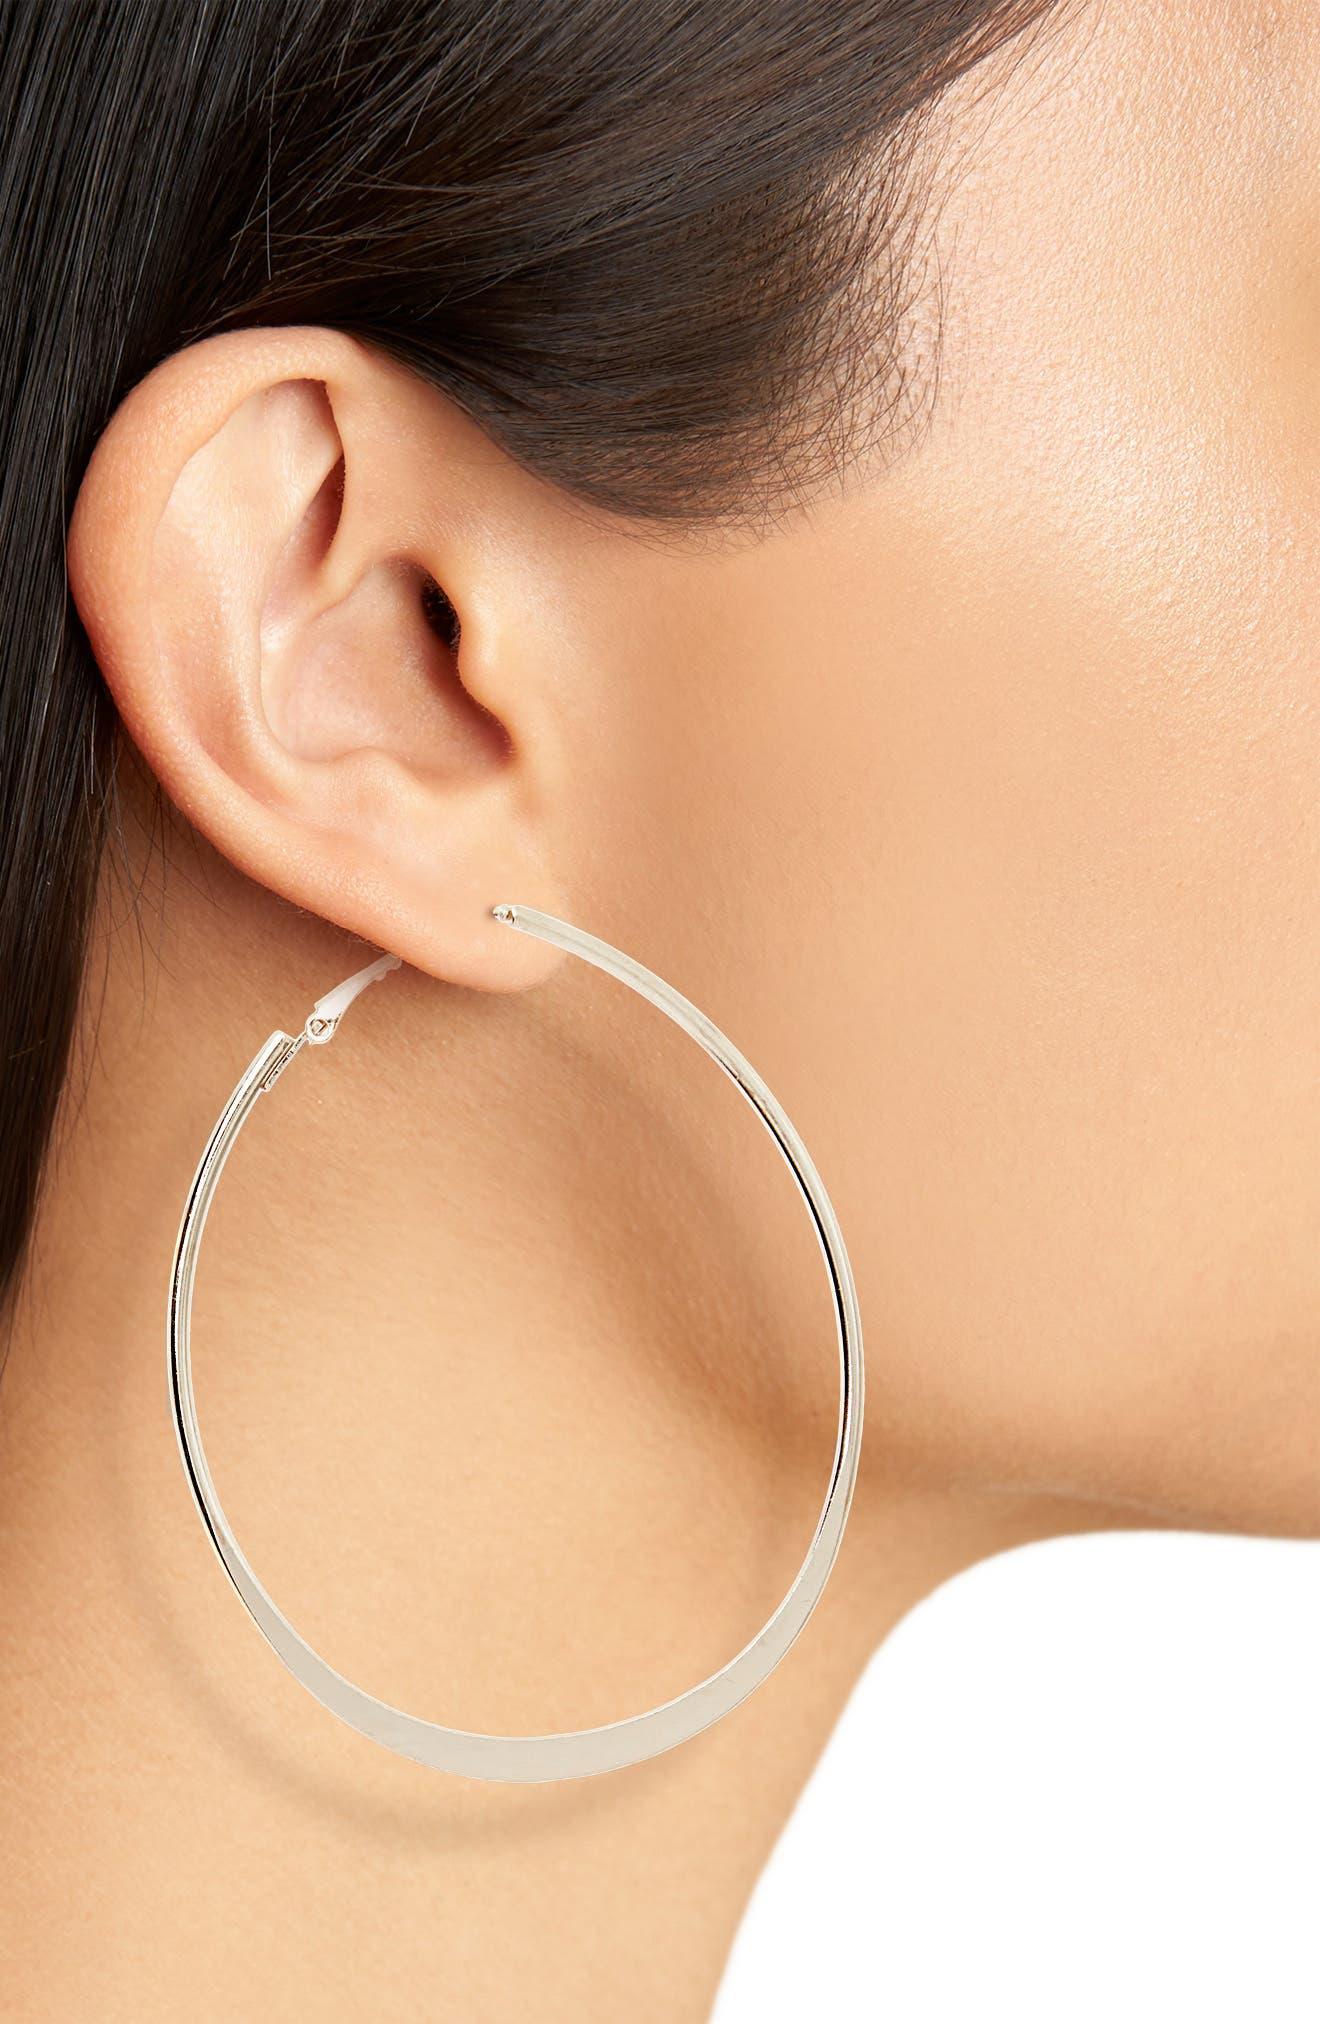 Oval Hoop Earrings,                             Alternate thumbnail 2, color,                             Silver